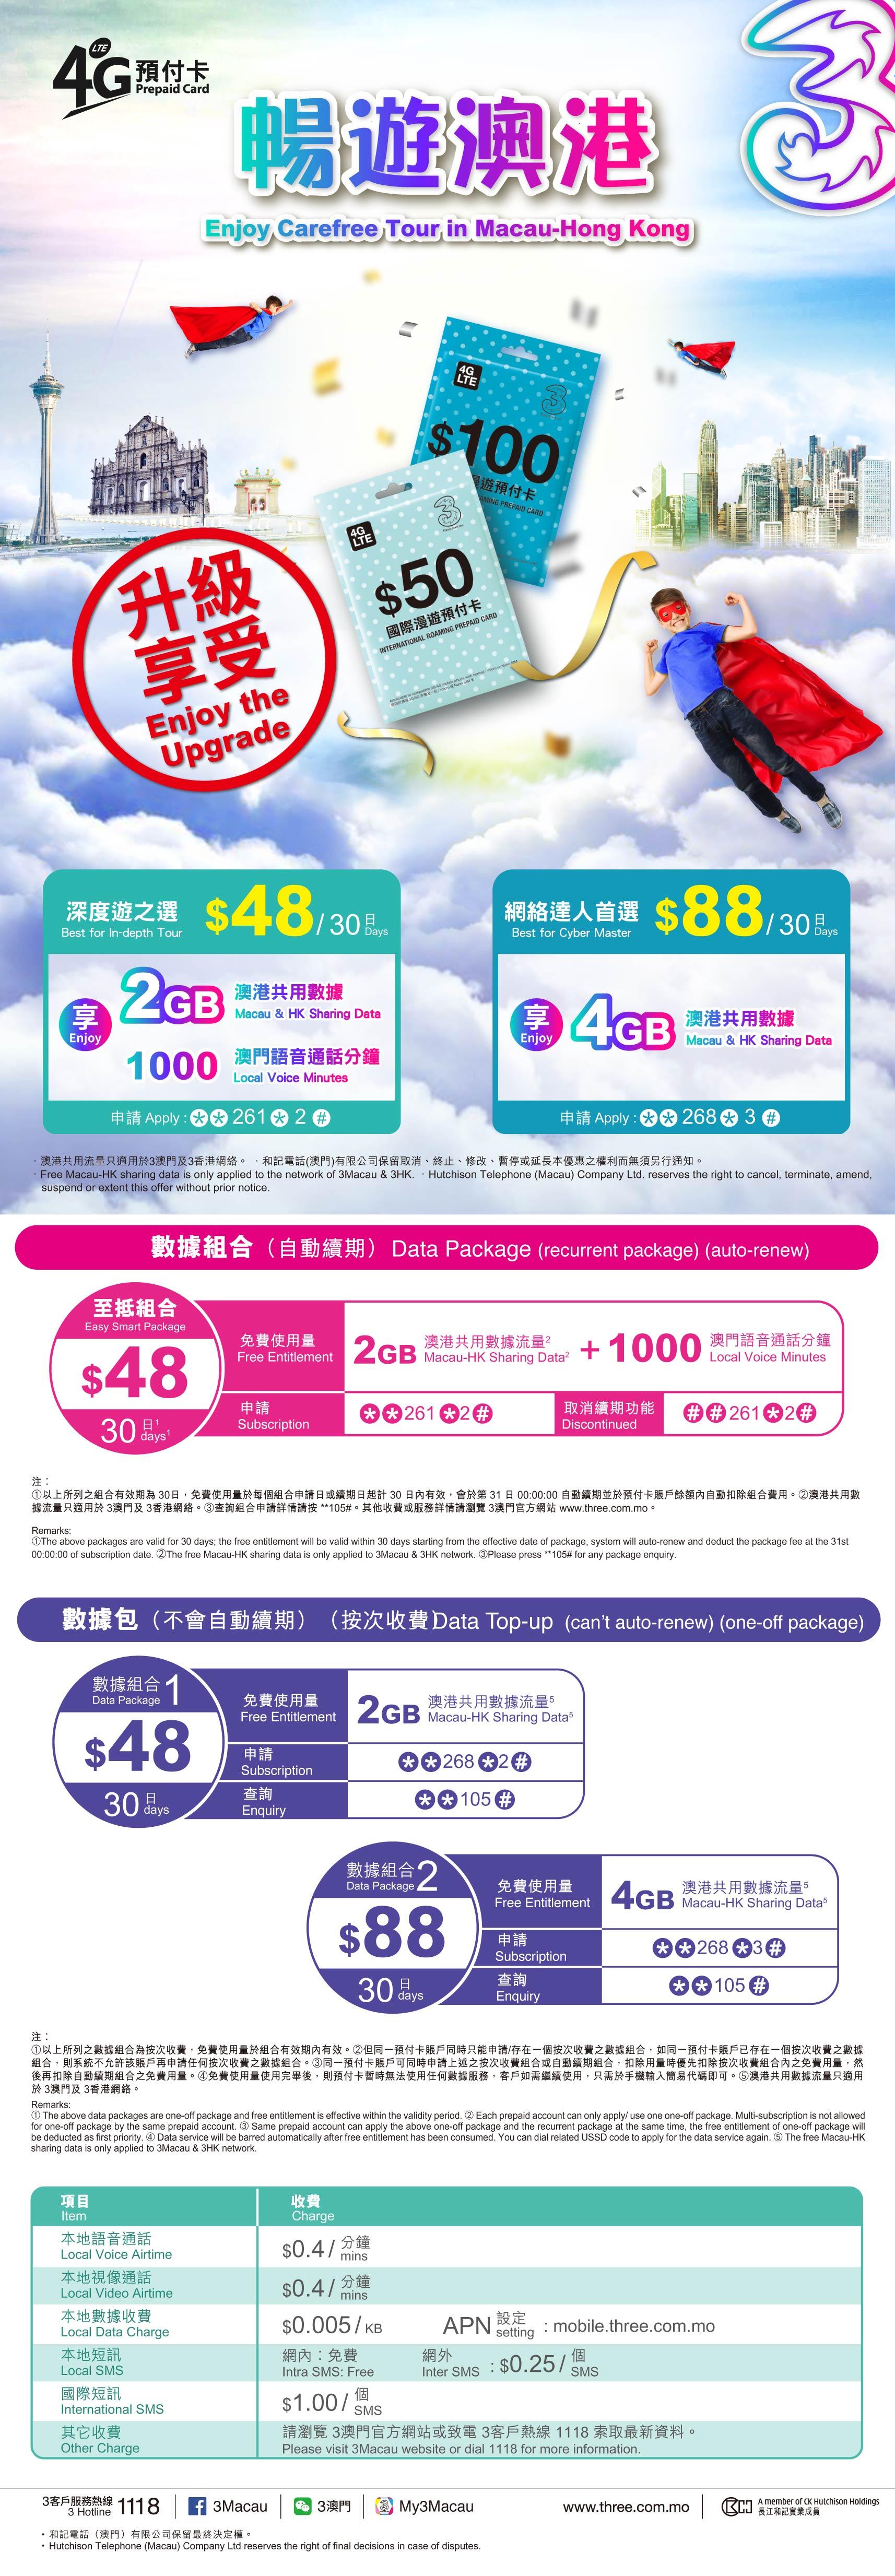 Threecommo 3g Macau Voucher 3 1gb More Details